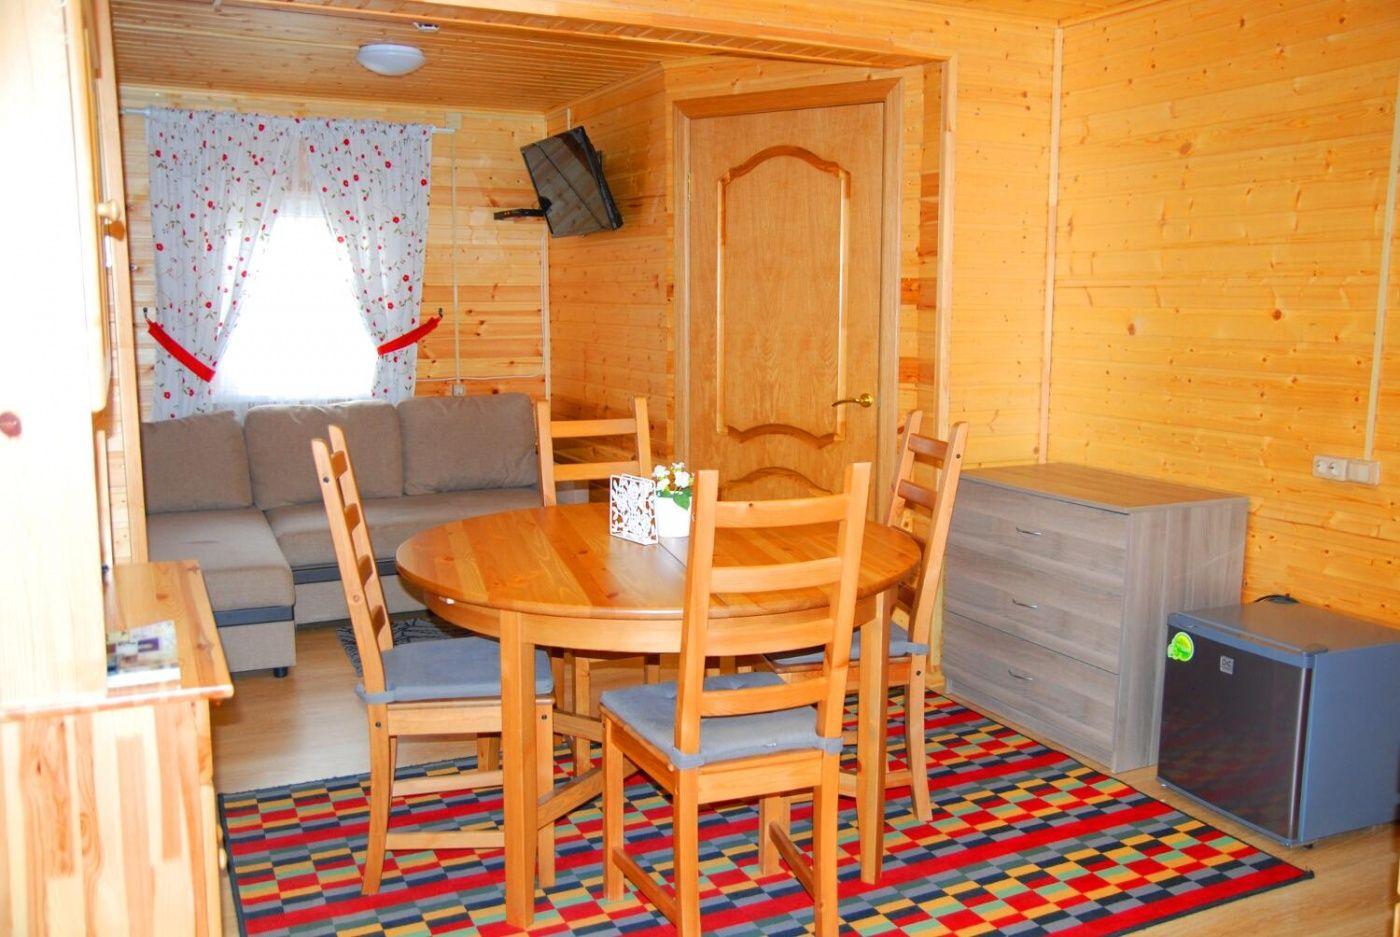 Резиденция Комфорта «Family Fishing» Краснодарский край Дом №9, фото 4